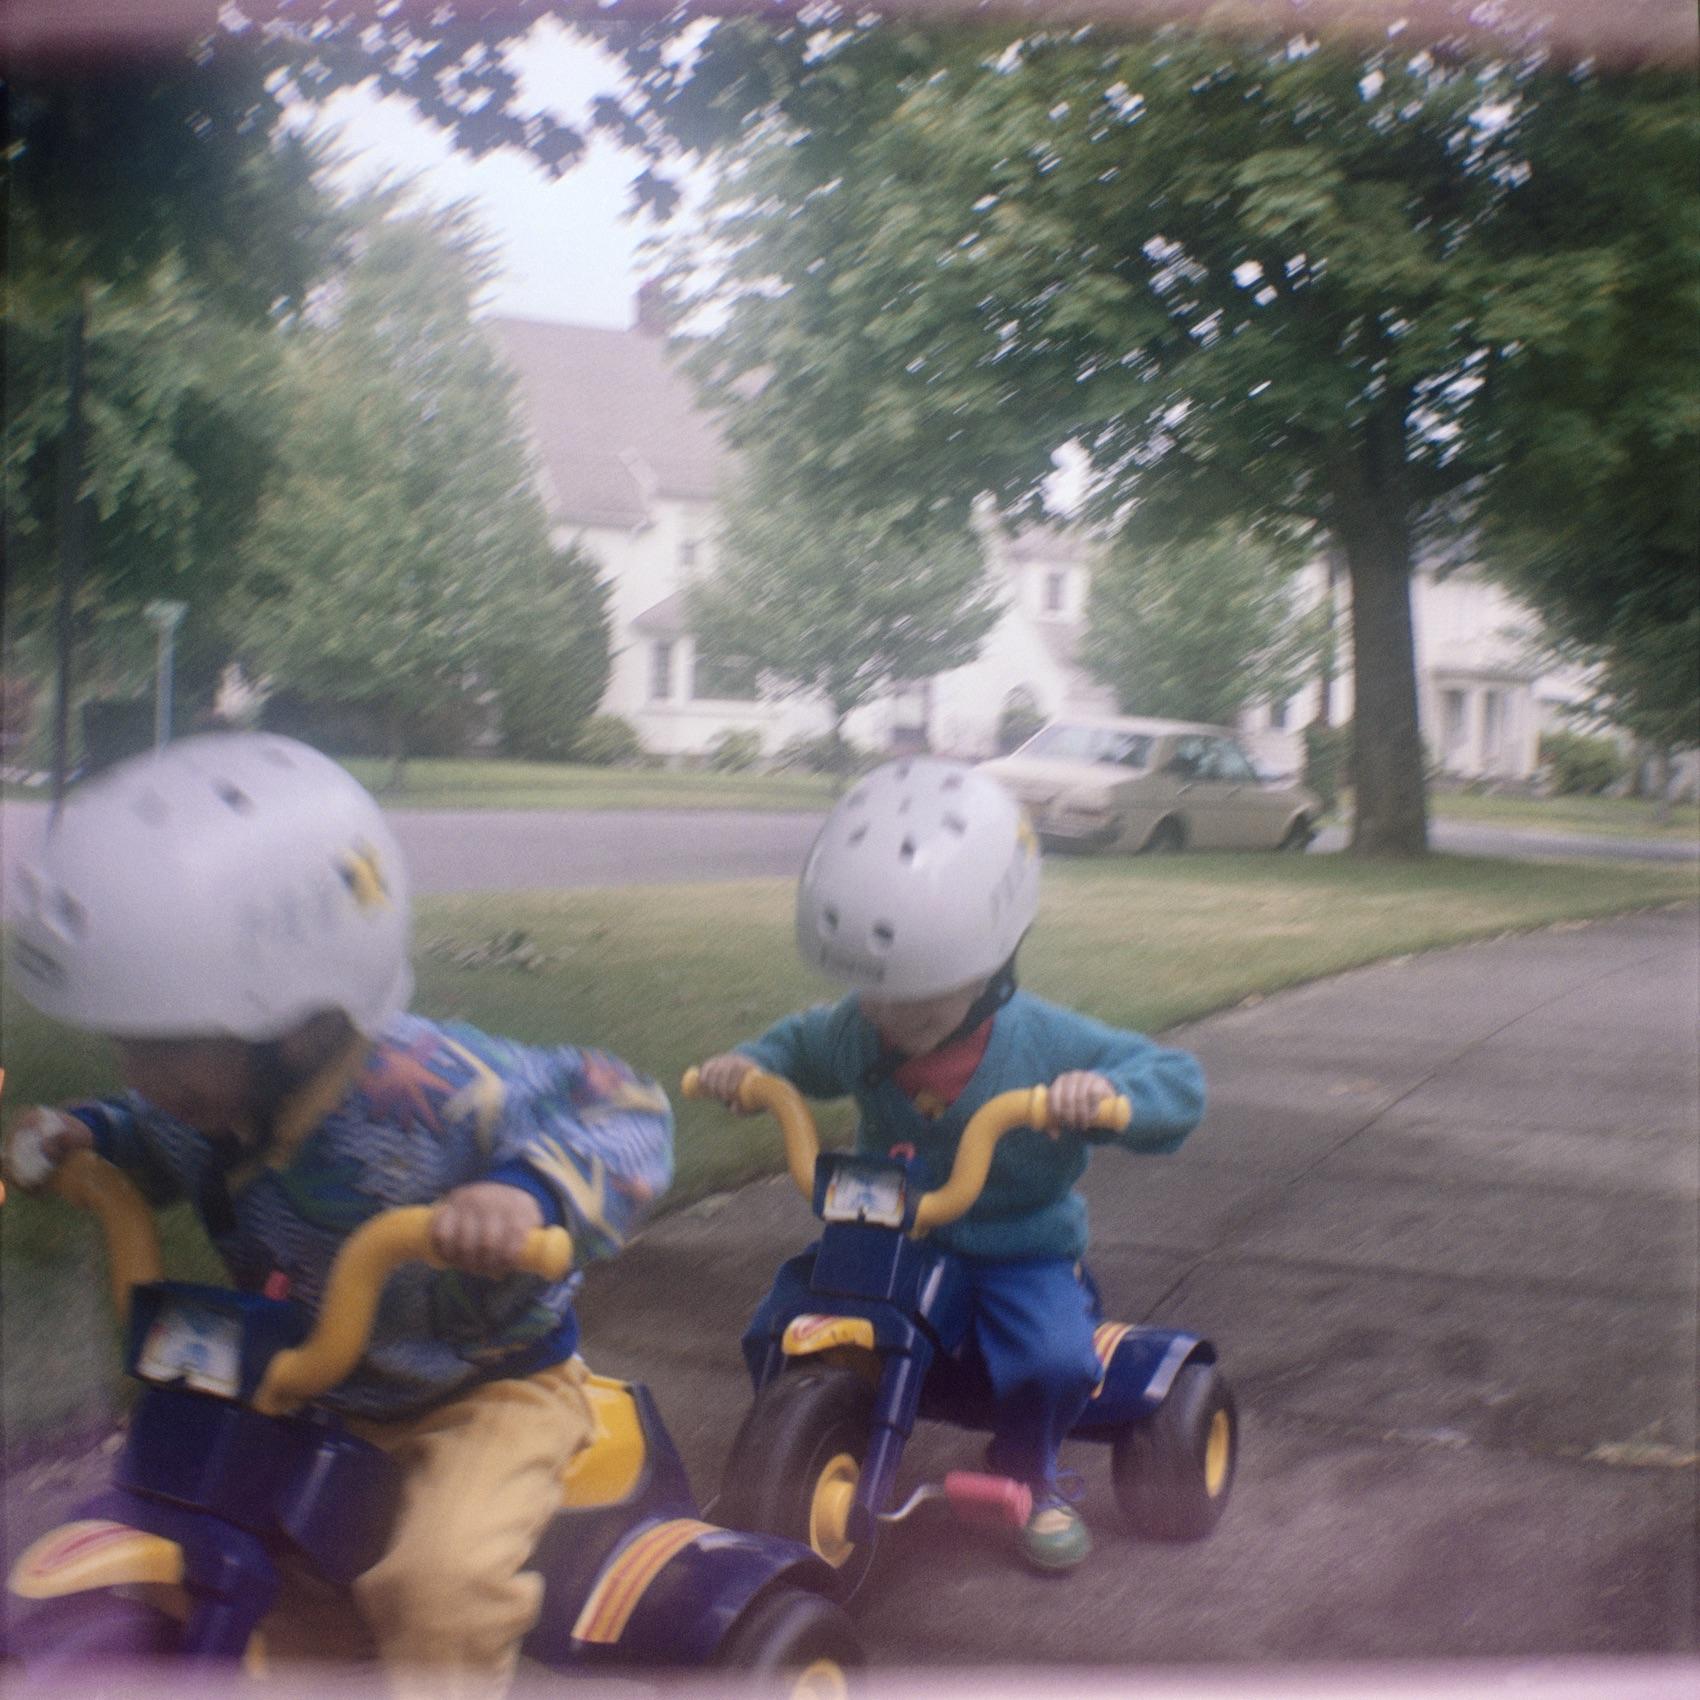 05_Ben and Daniel on their Trikes, 1989